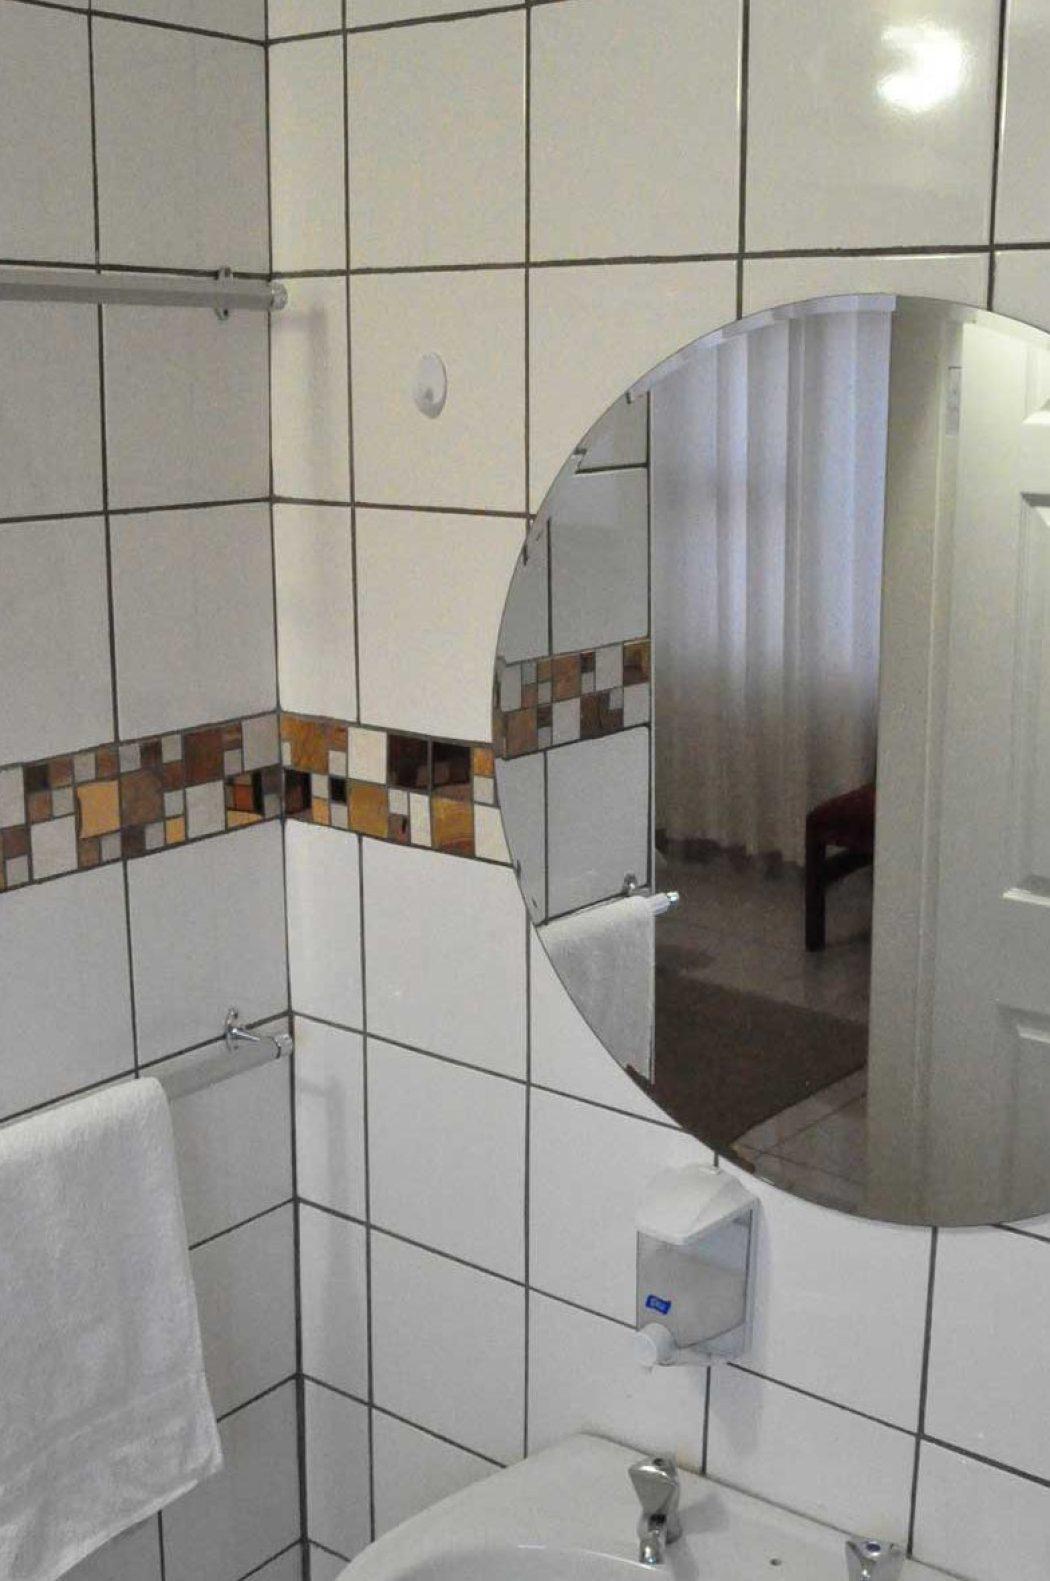 Timoslodge_Bathroom_Mirror